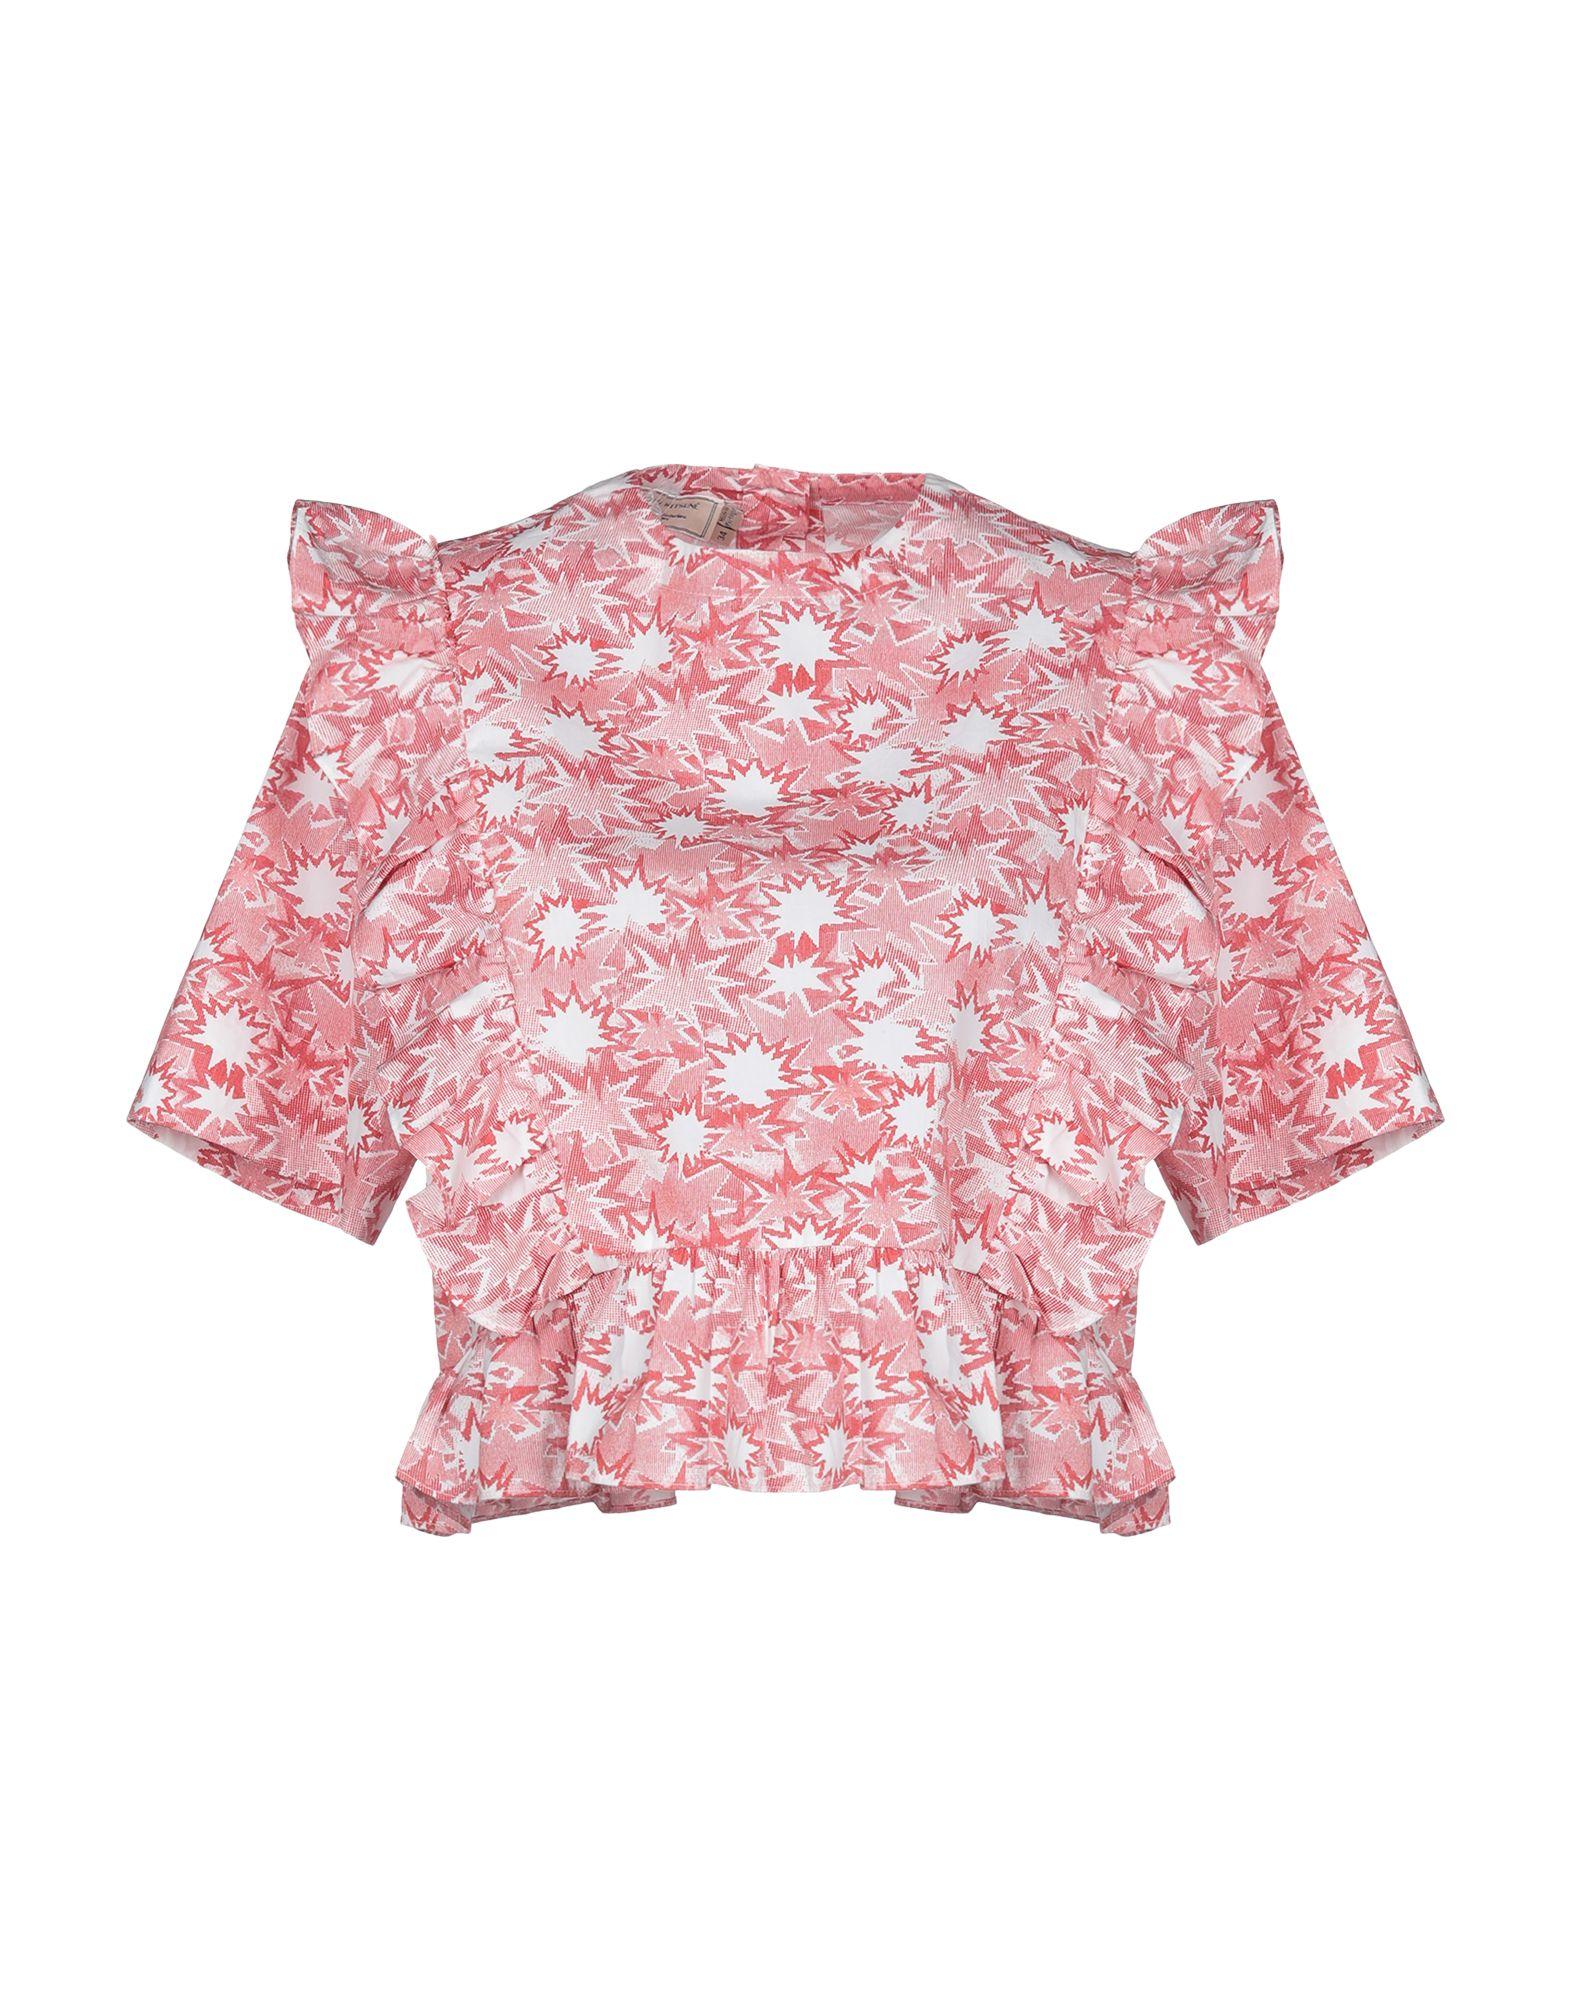 MAISON KITSUNÉ Блузка maison kitsuné свитер